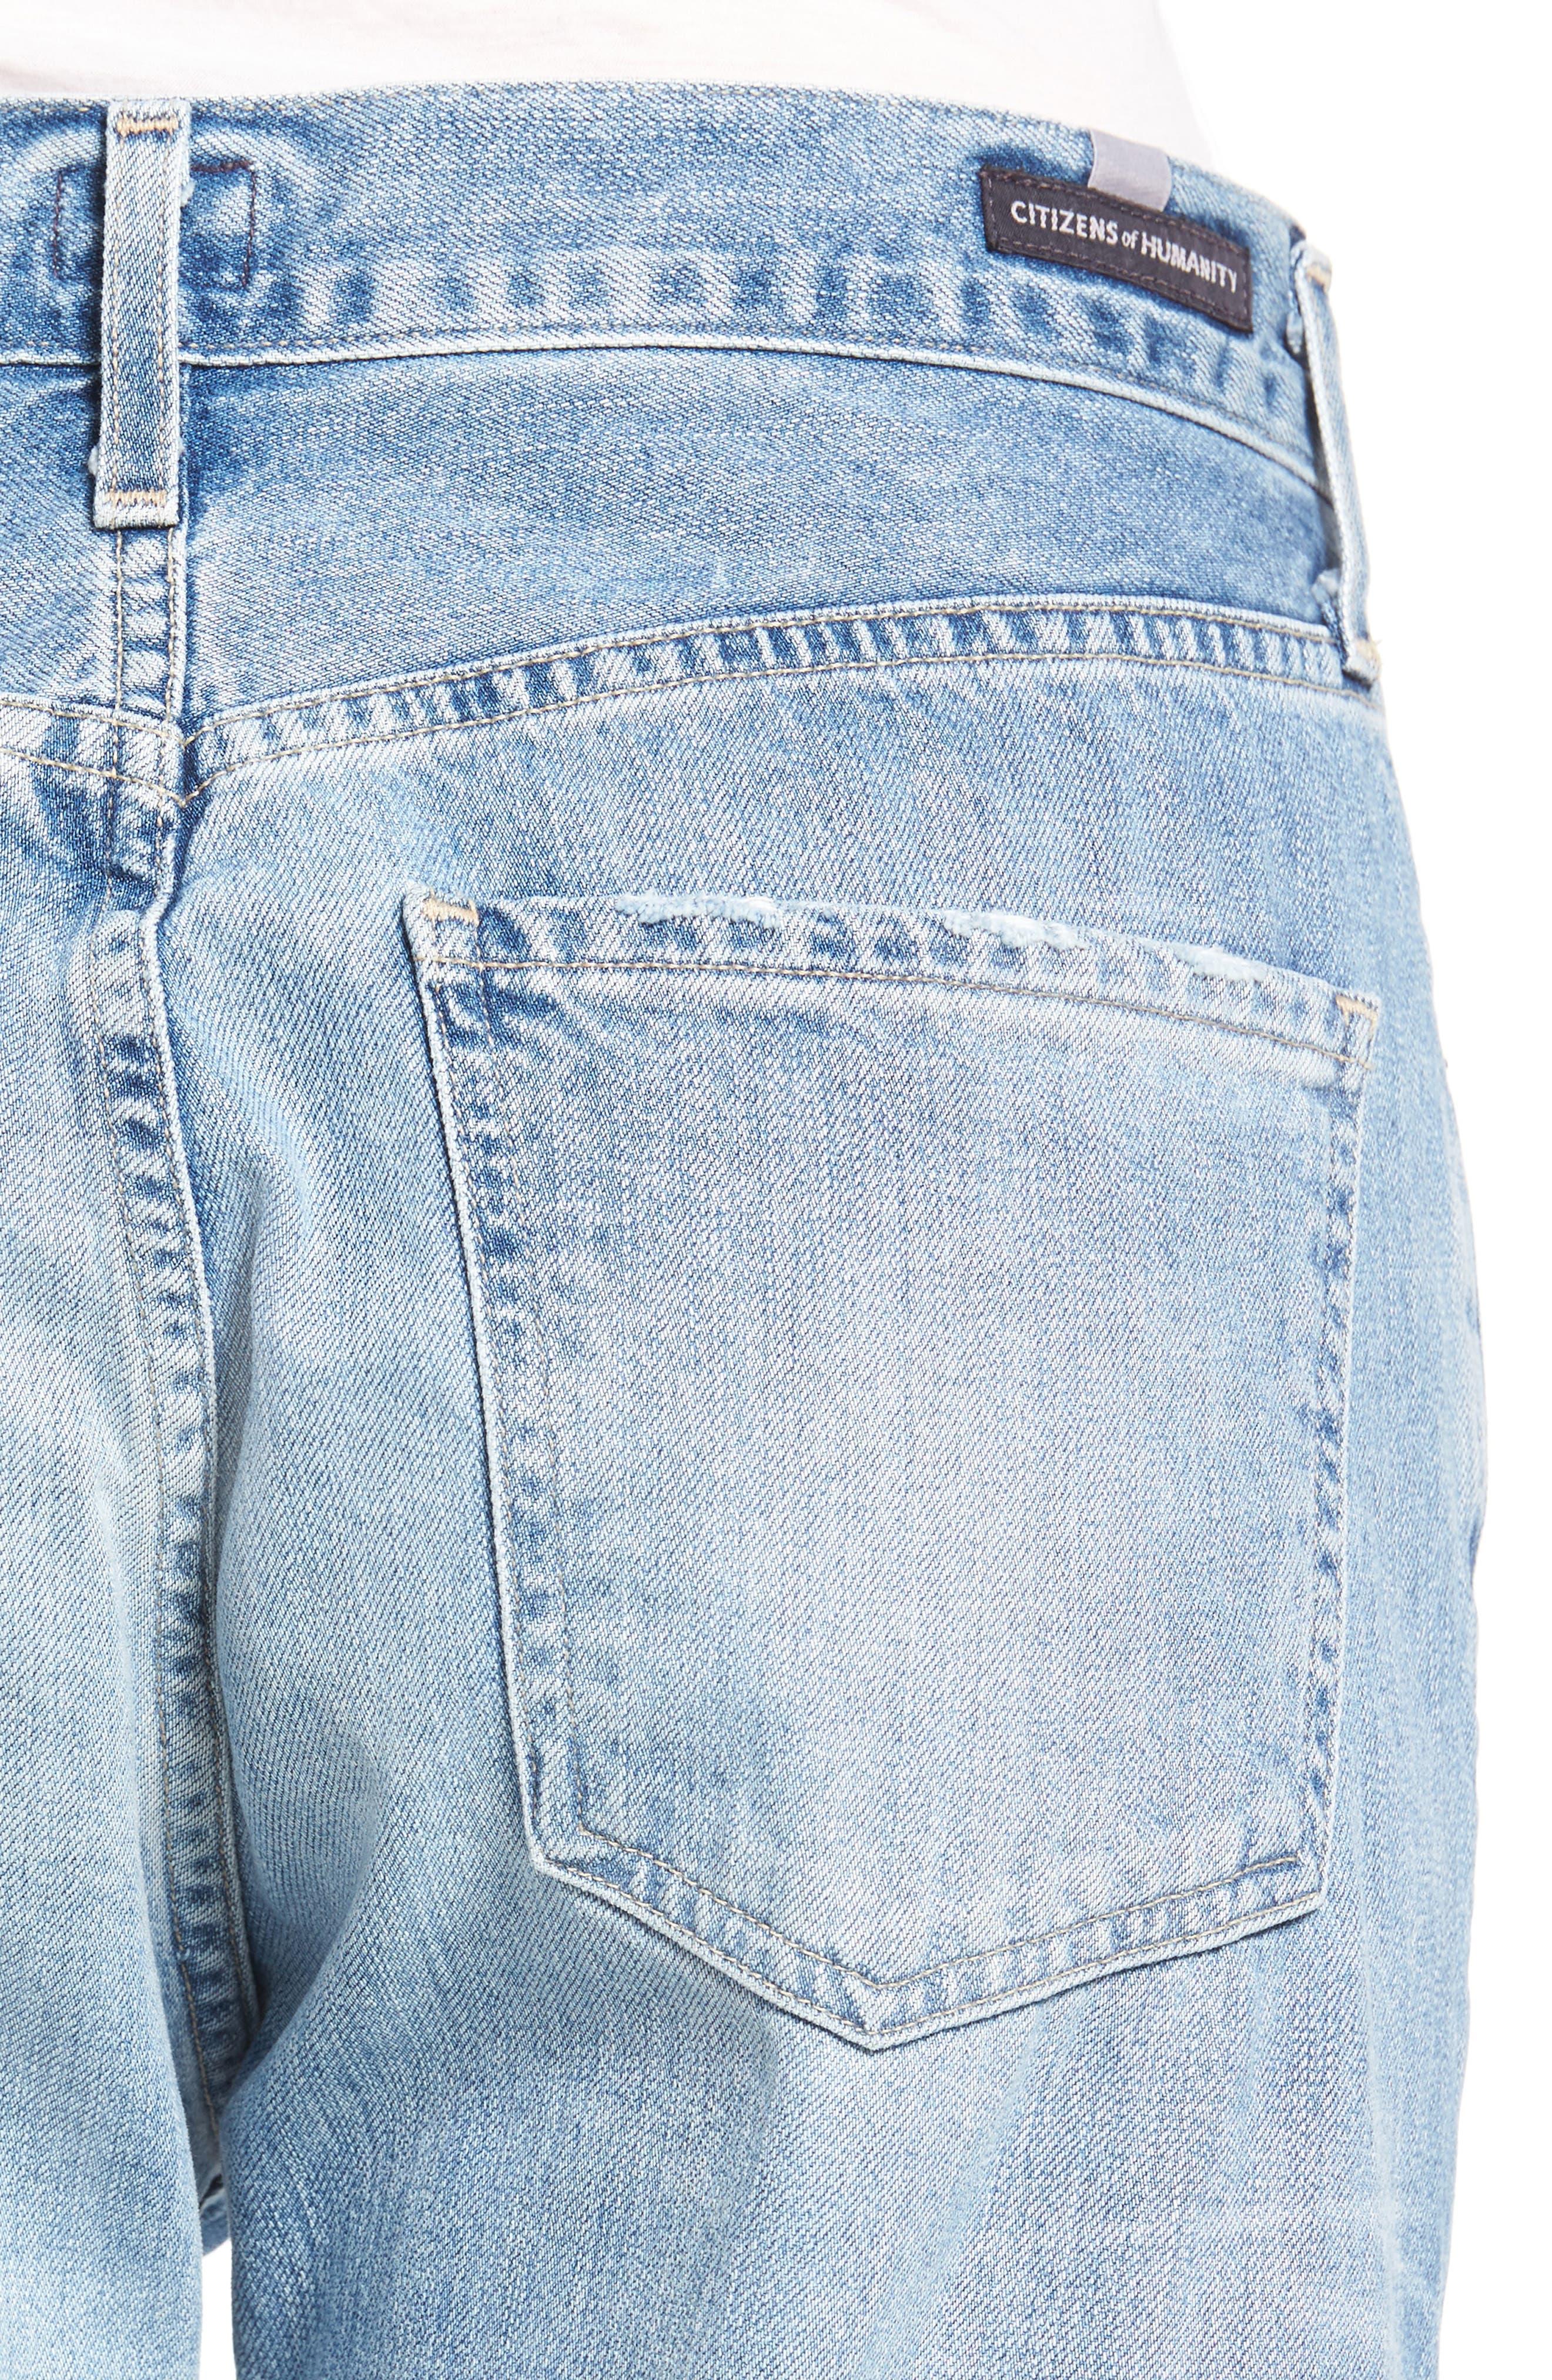 CITIZENS OF HUMANITY, Liya High Waist Boyfriend Jeans, Alternate thumbnail 4, color, SUNDAY MORNING